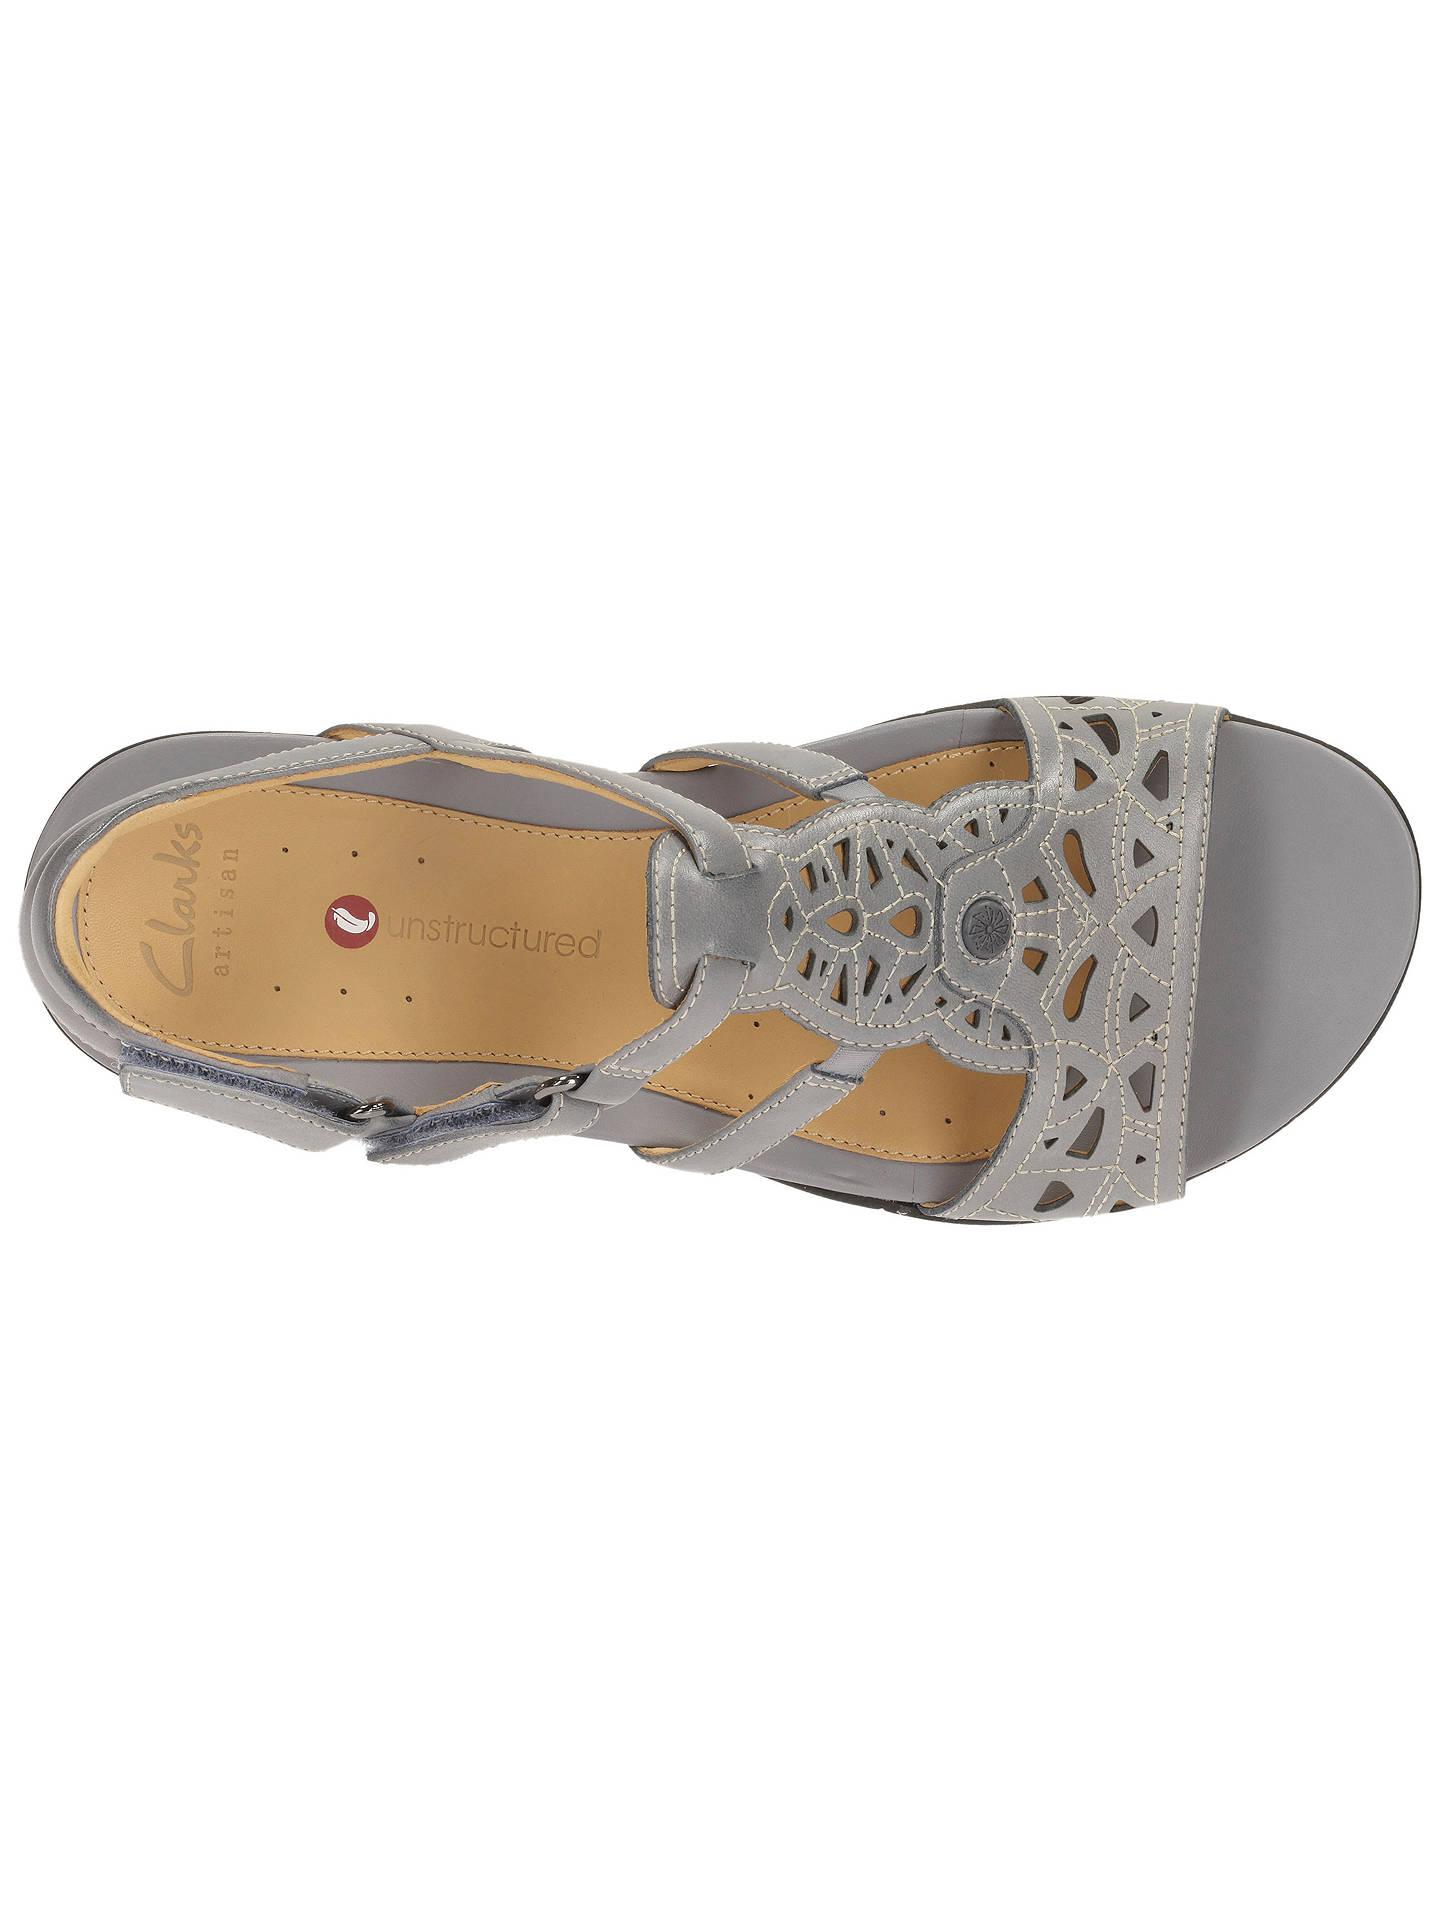 Clarks Un Valencia Leather Sandals at John Lewis & Partners